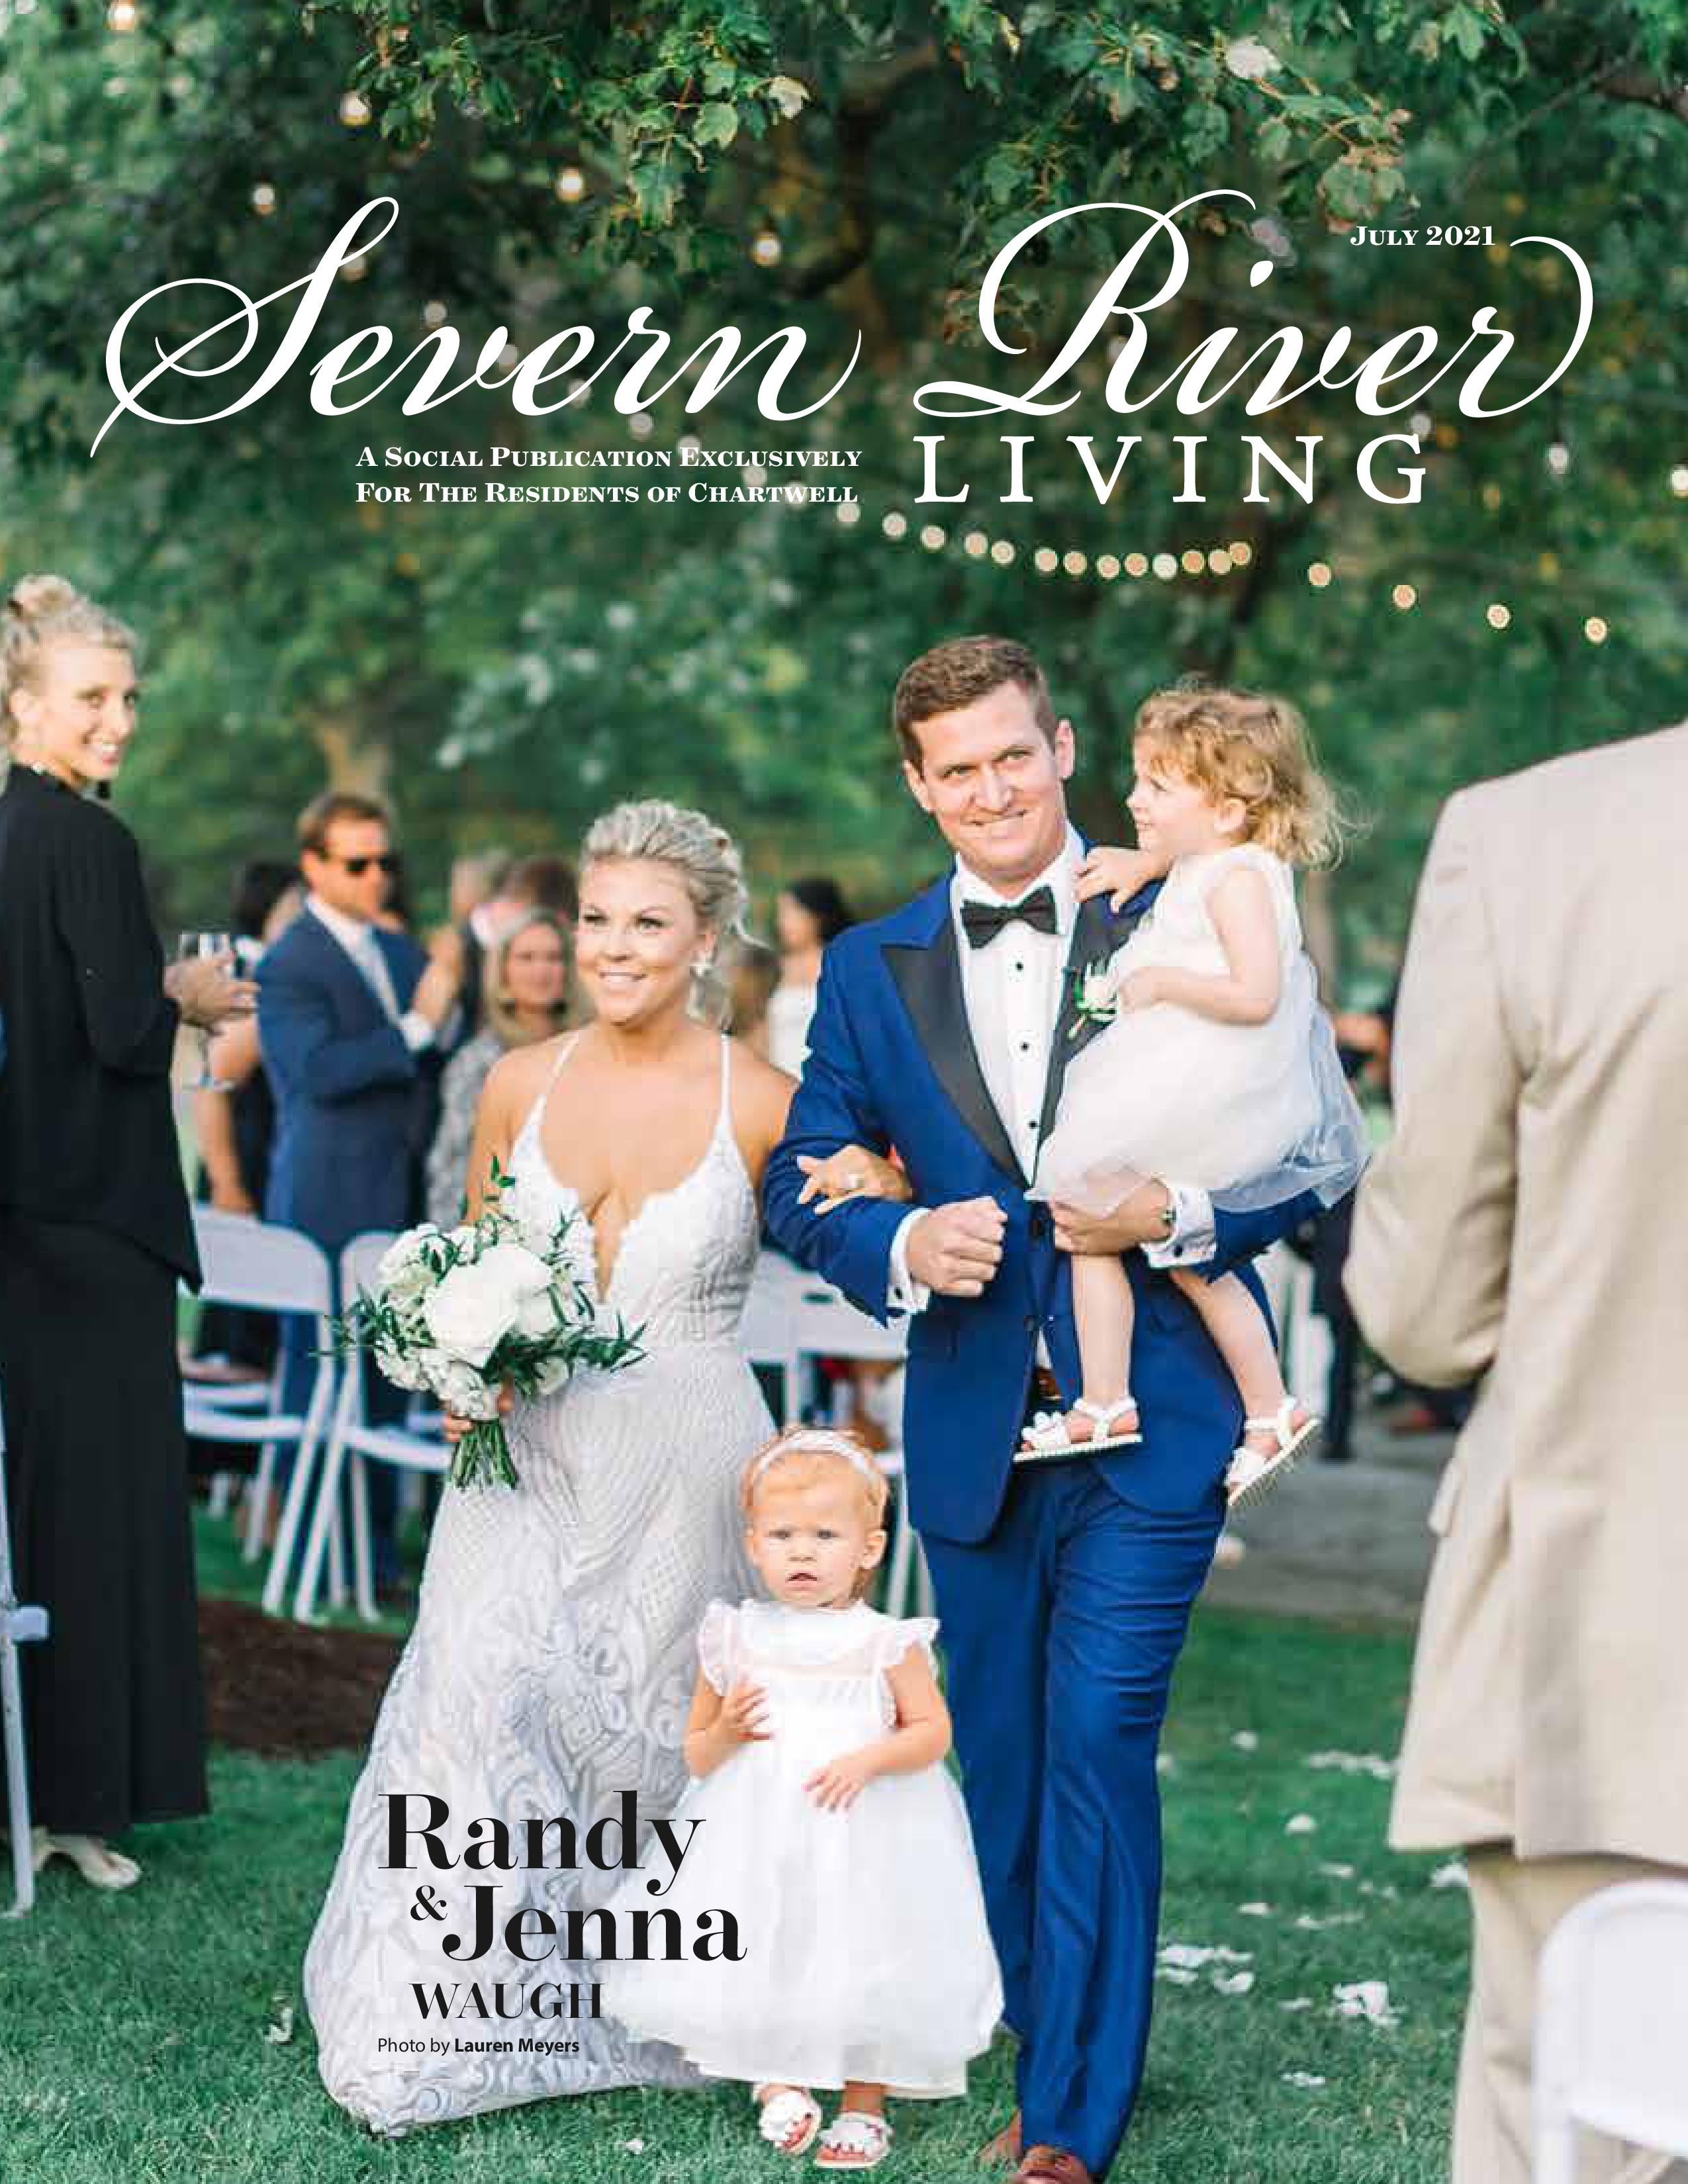 Severn River Living 2021-07-01